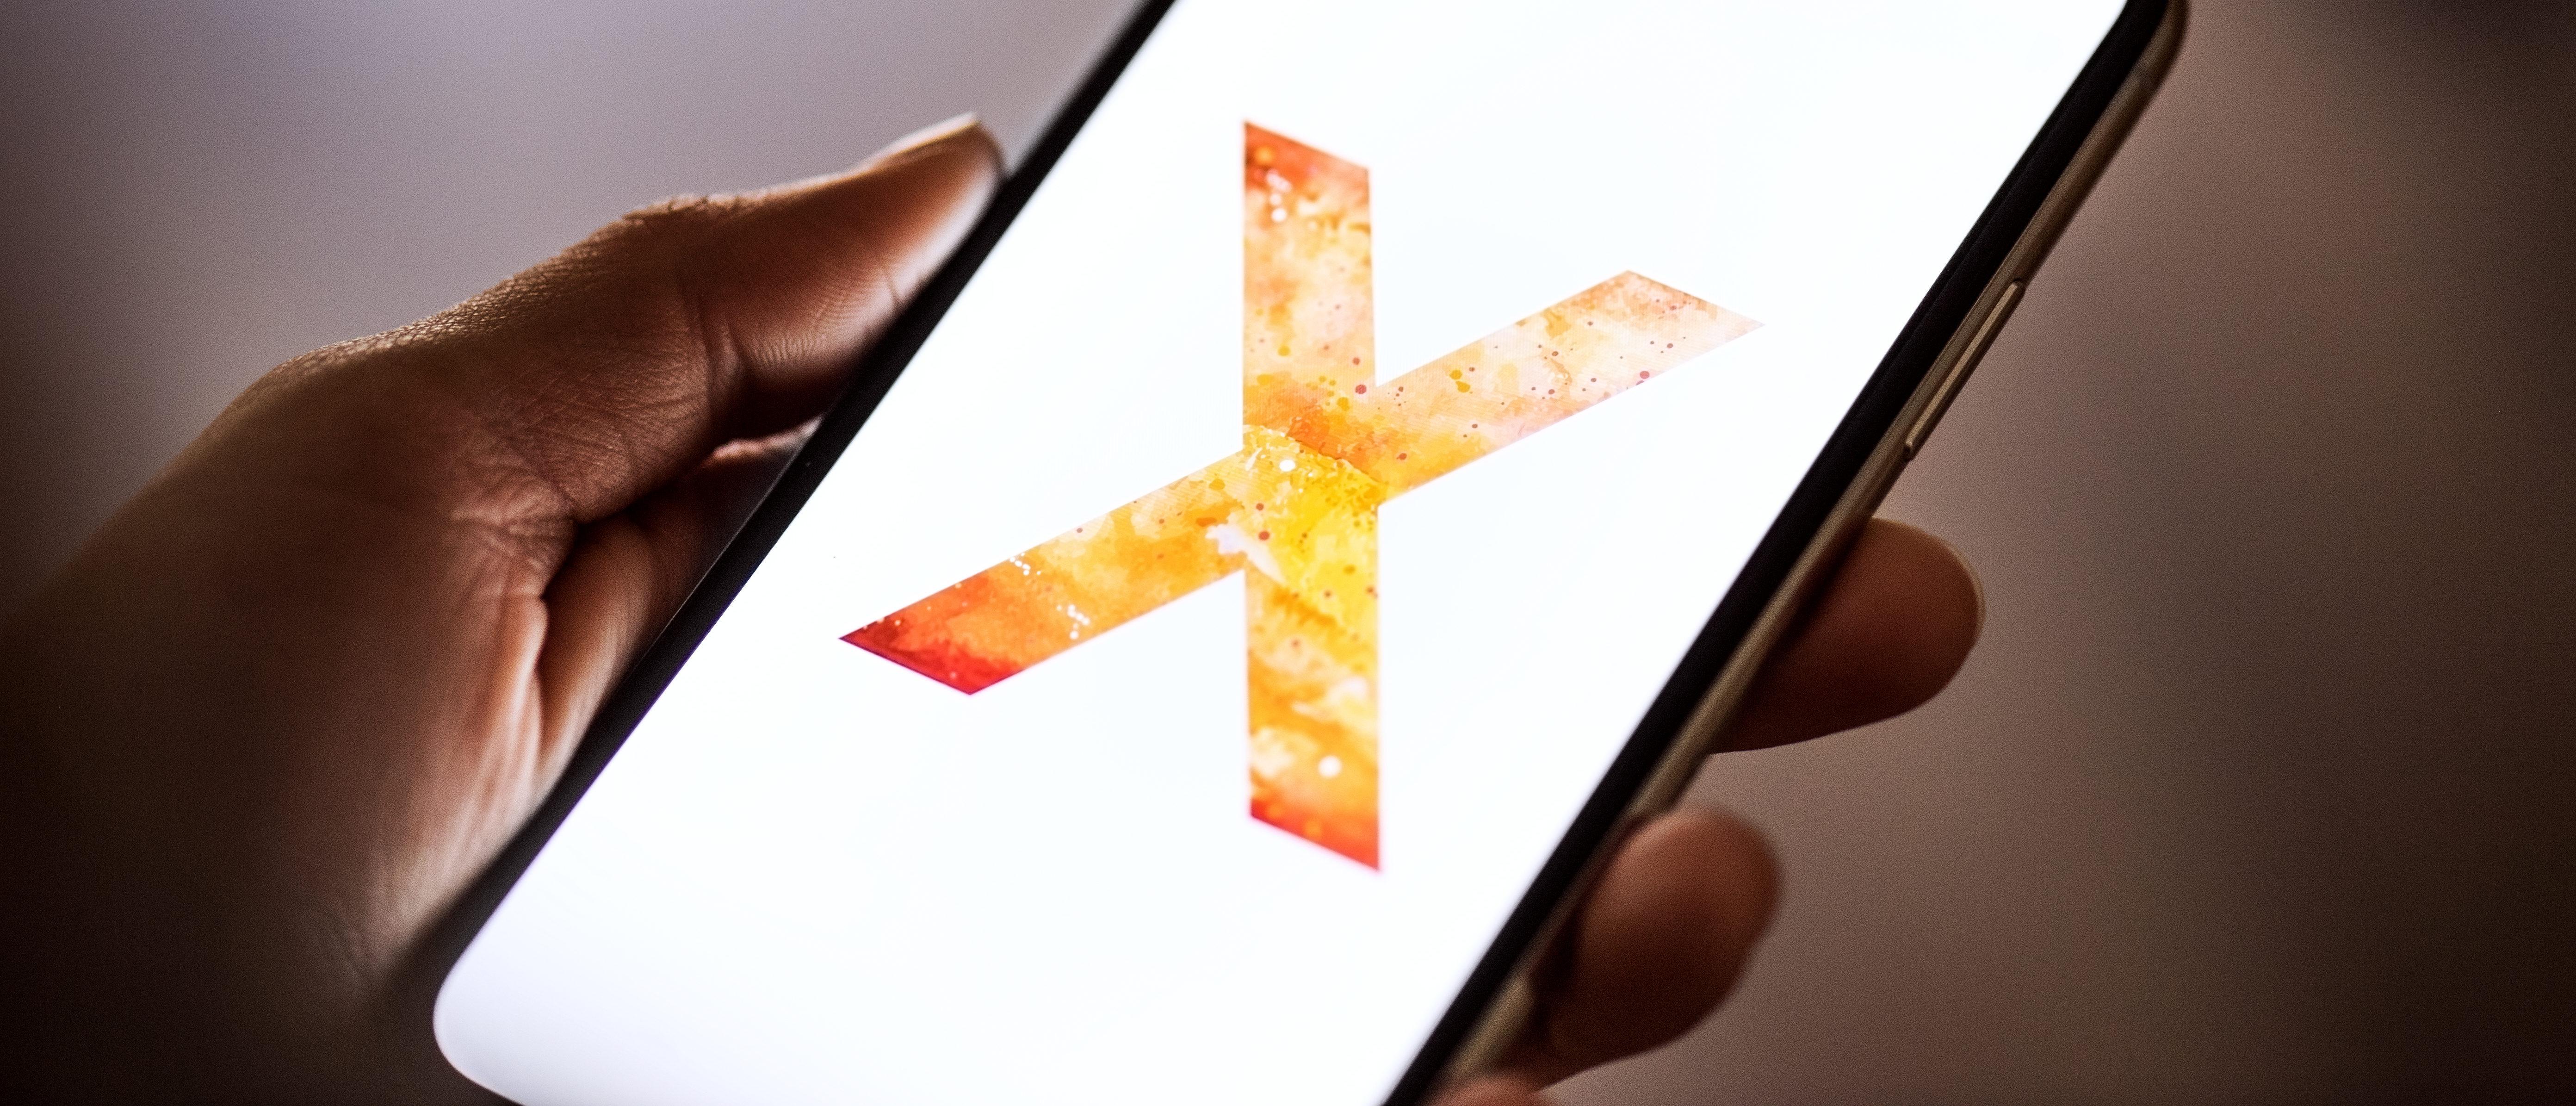 New Apple iPhone X smartphone.